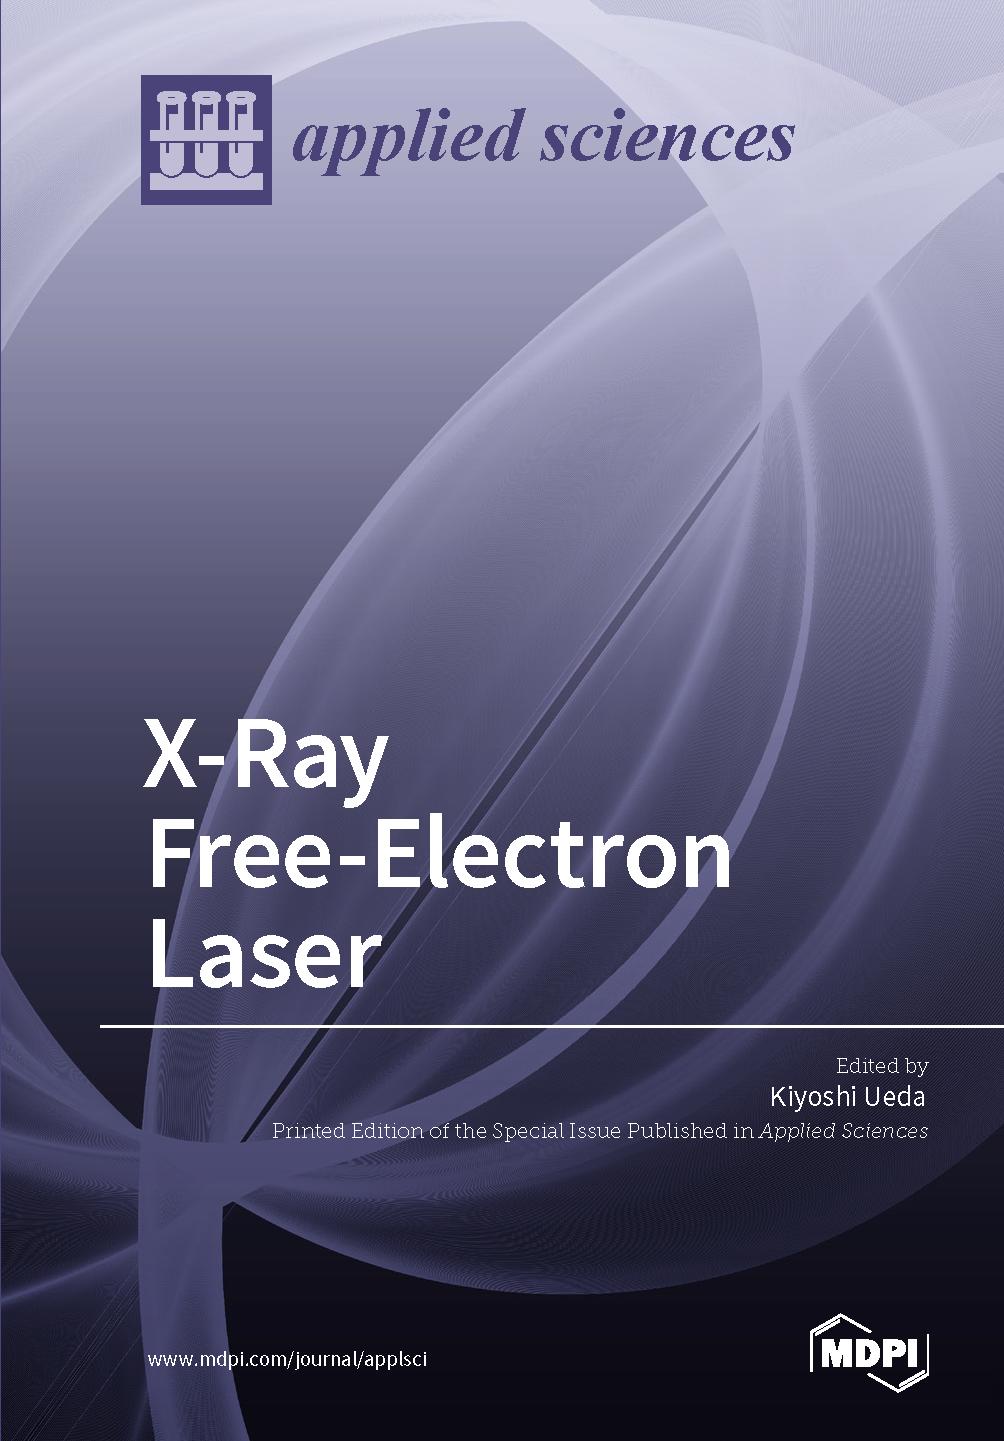 X-Ray Free-Electron Laser